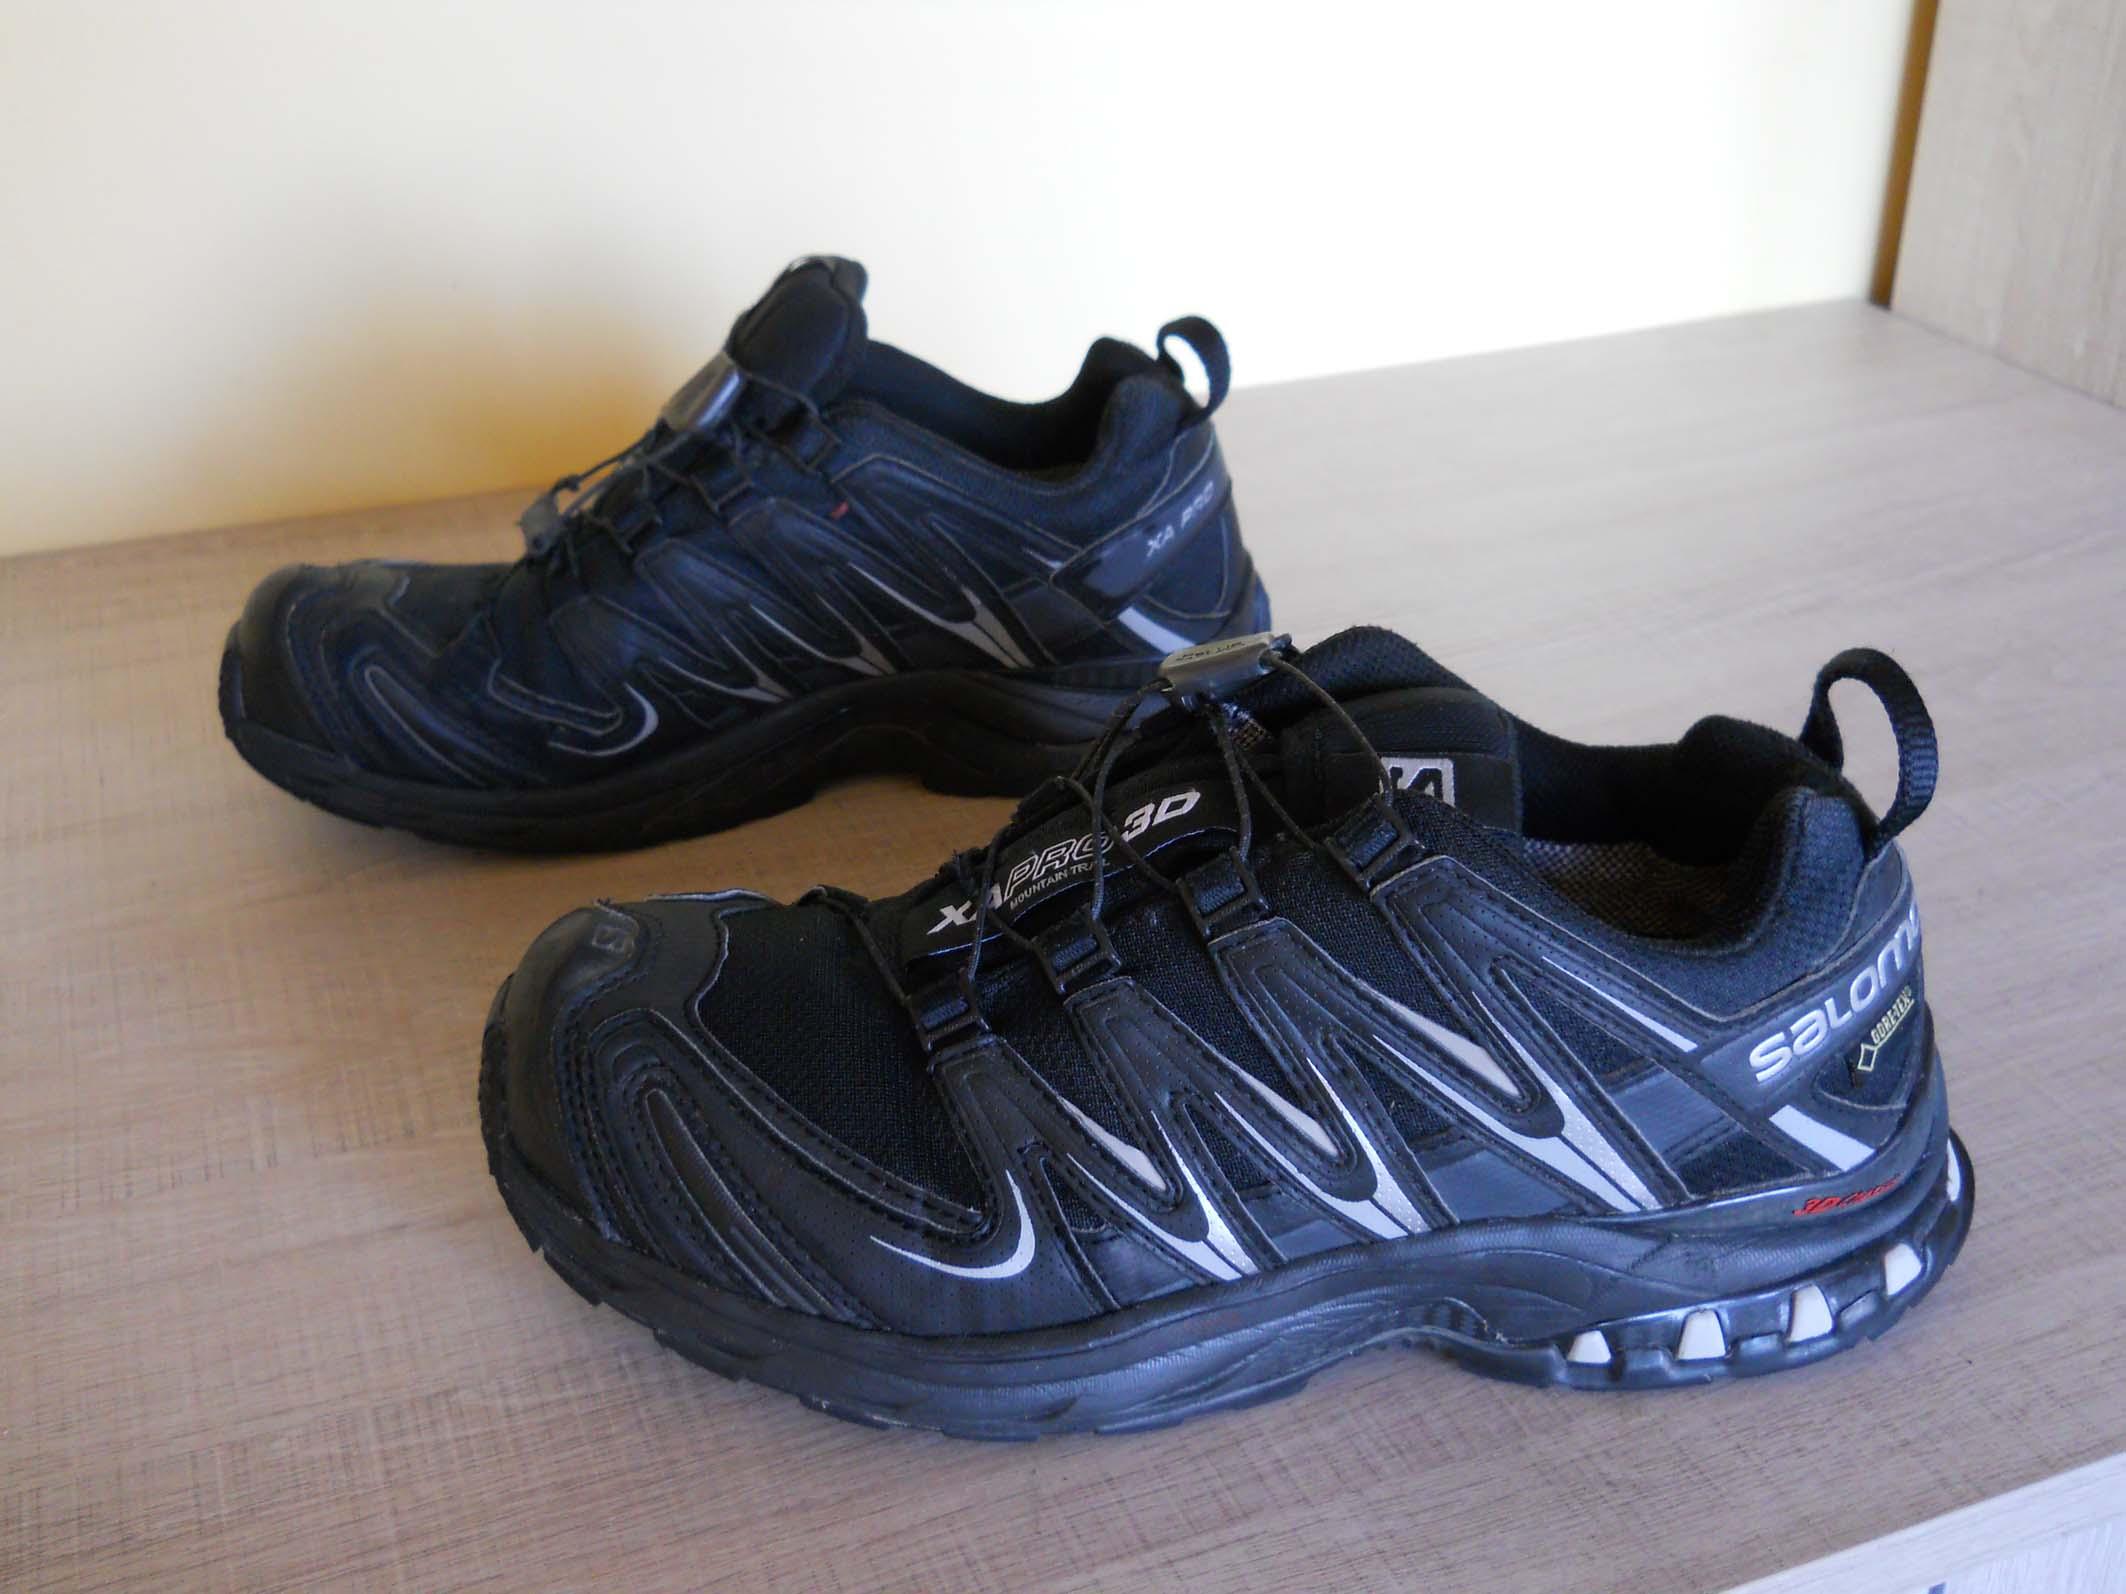 SALOMON XA PRO buty trekkingowe gore tex rozm 38